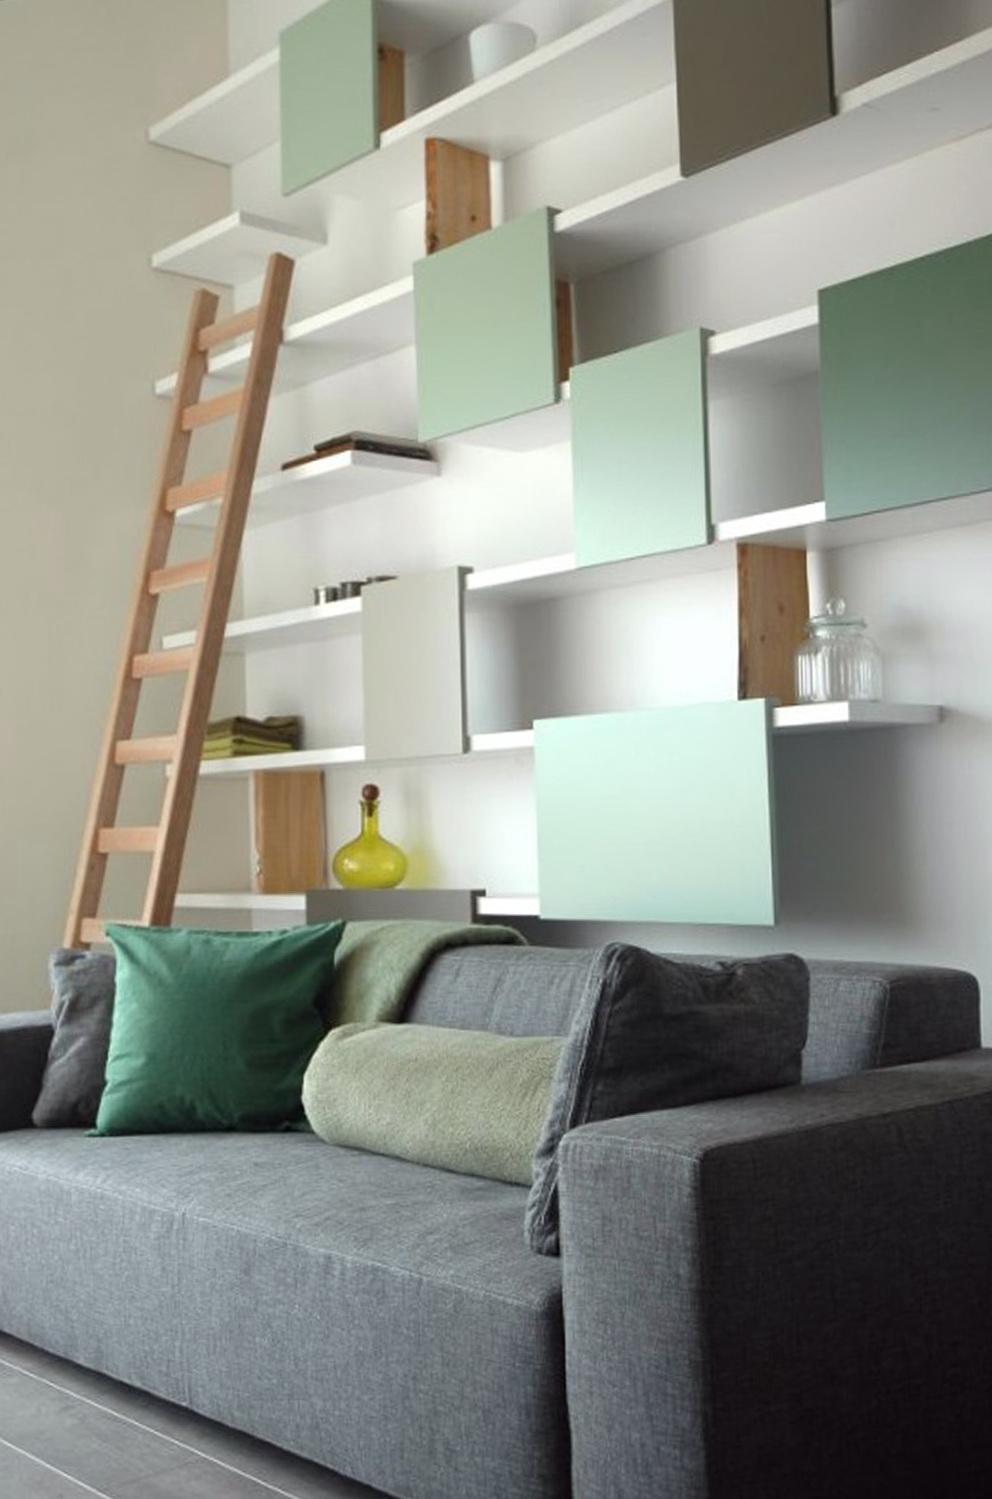 Contemporary Wall Shelves Design Ideas